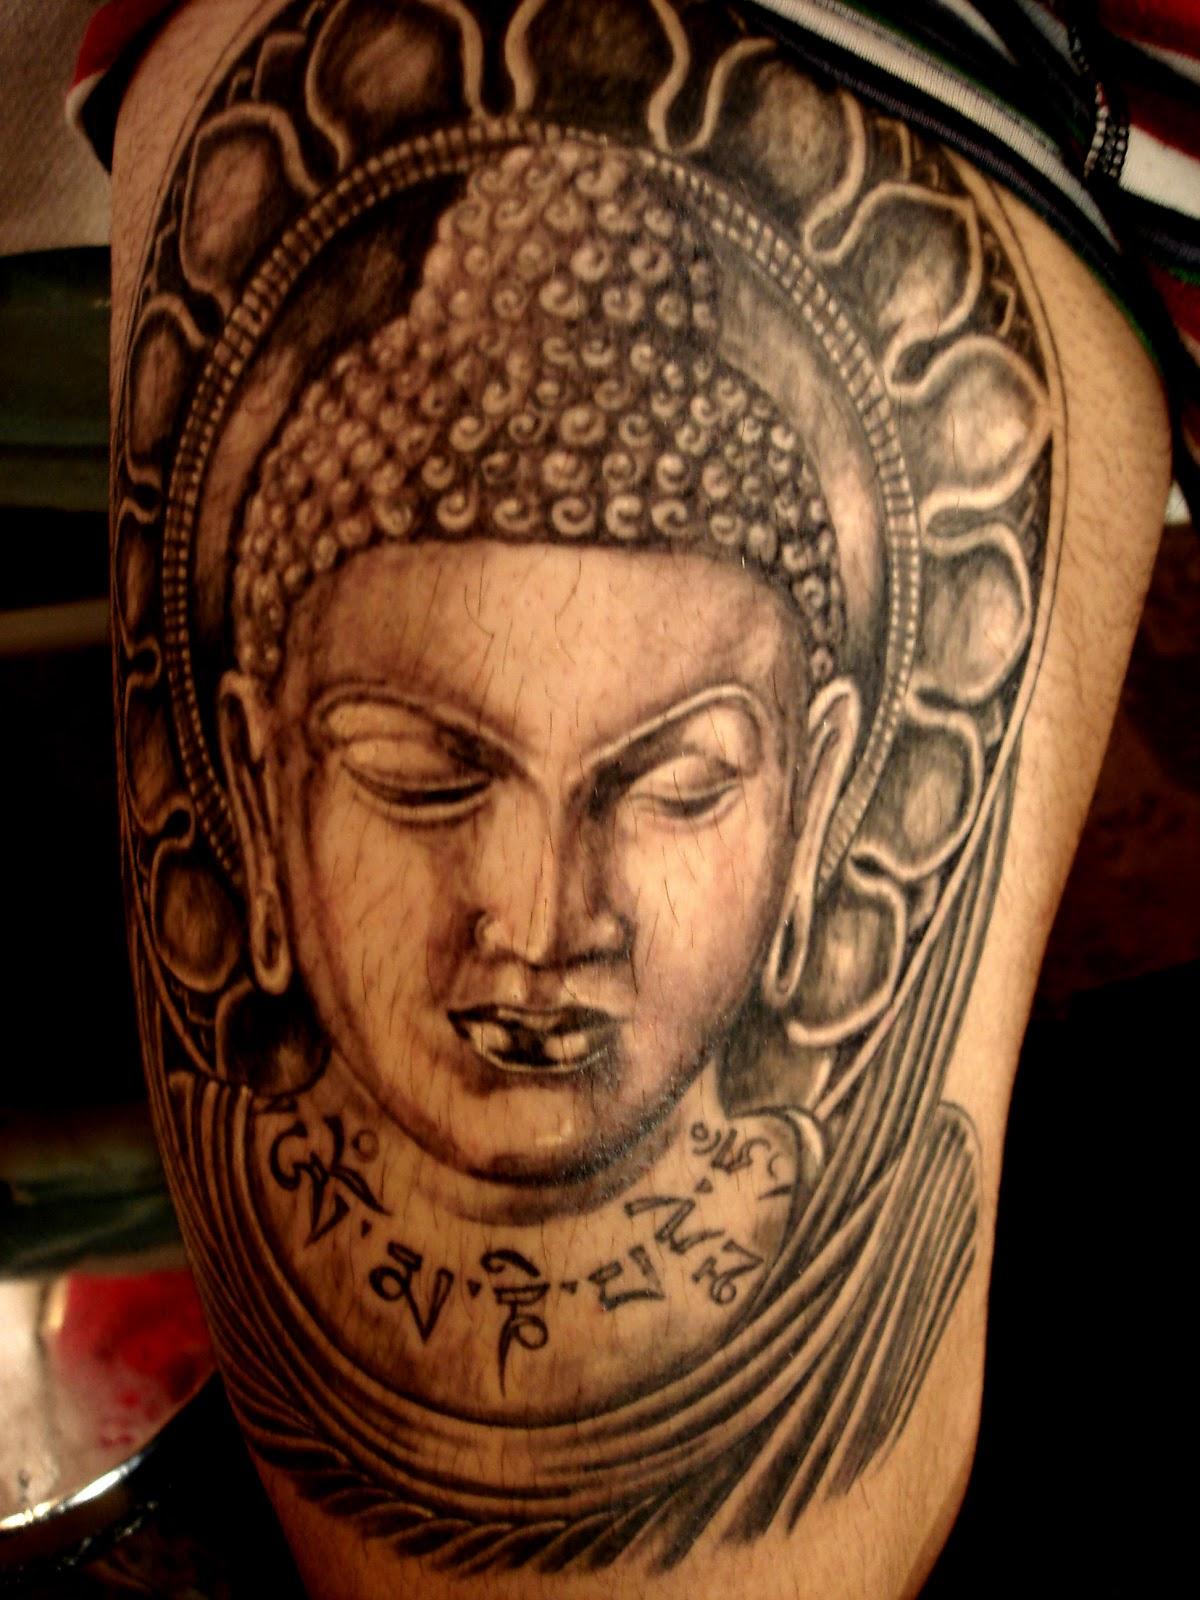 Buddhist Symbols And Meanings For Tattoos Buddhist Tattoos Desig...